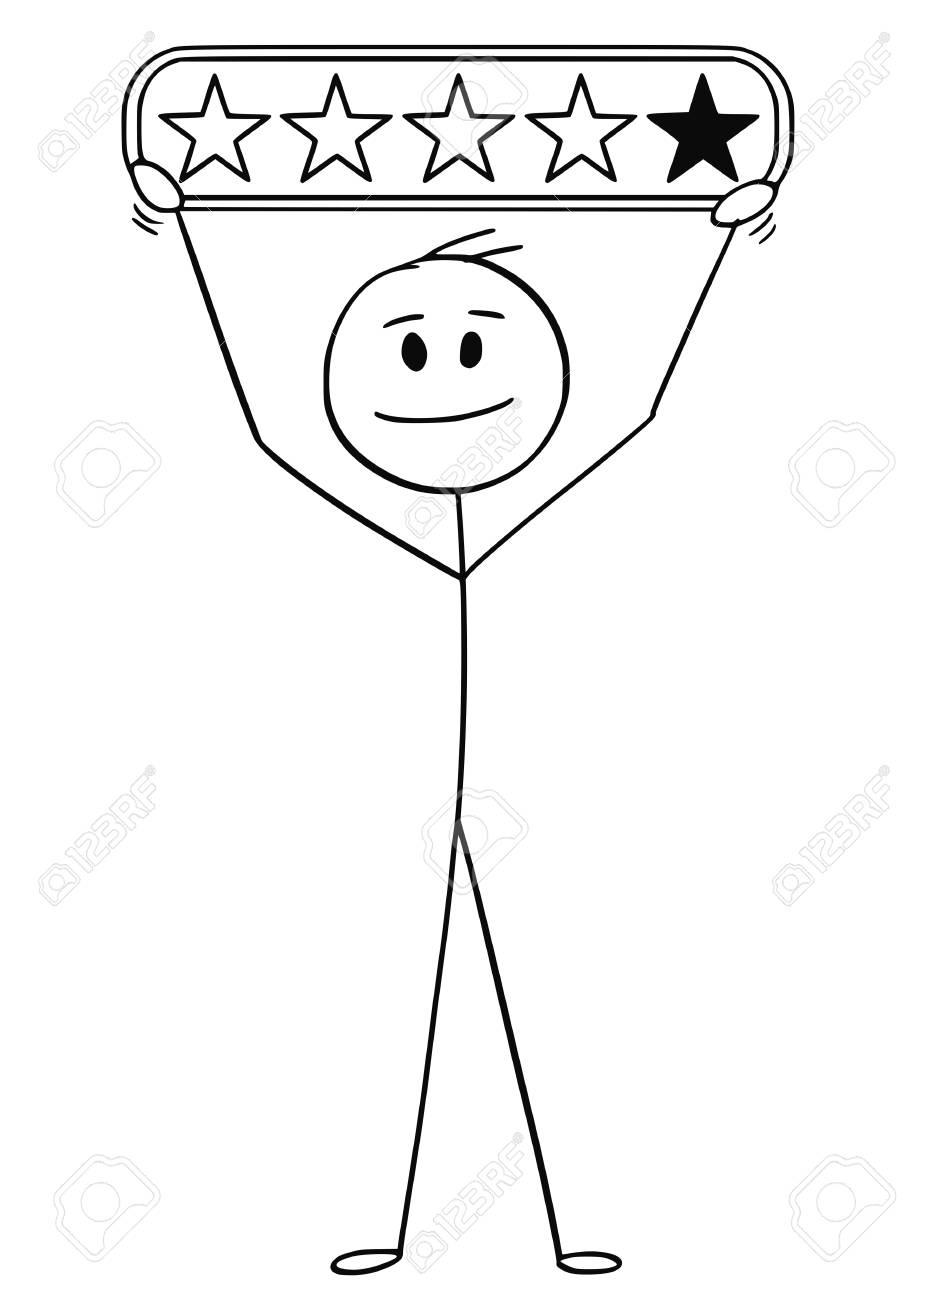 Stick person stick man clipart black and white free 2 - ClipartBarn